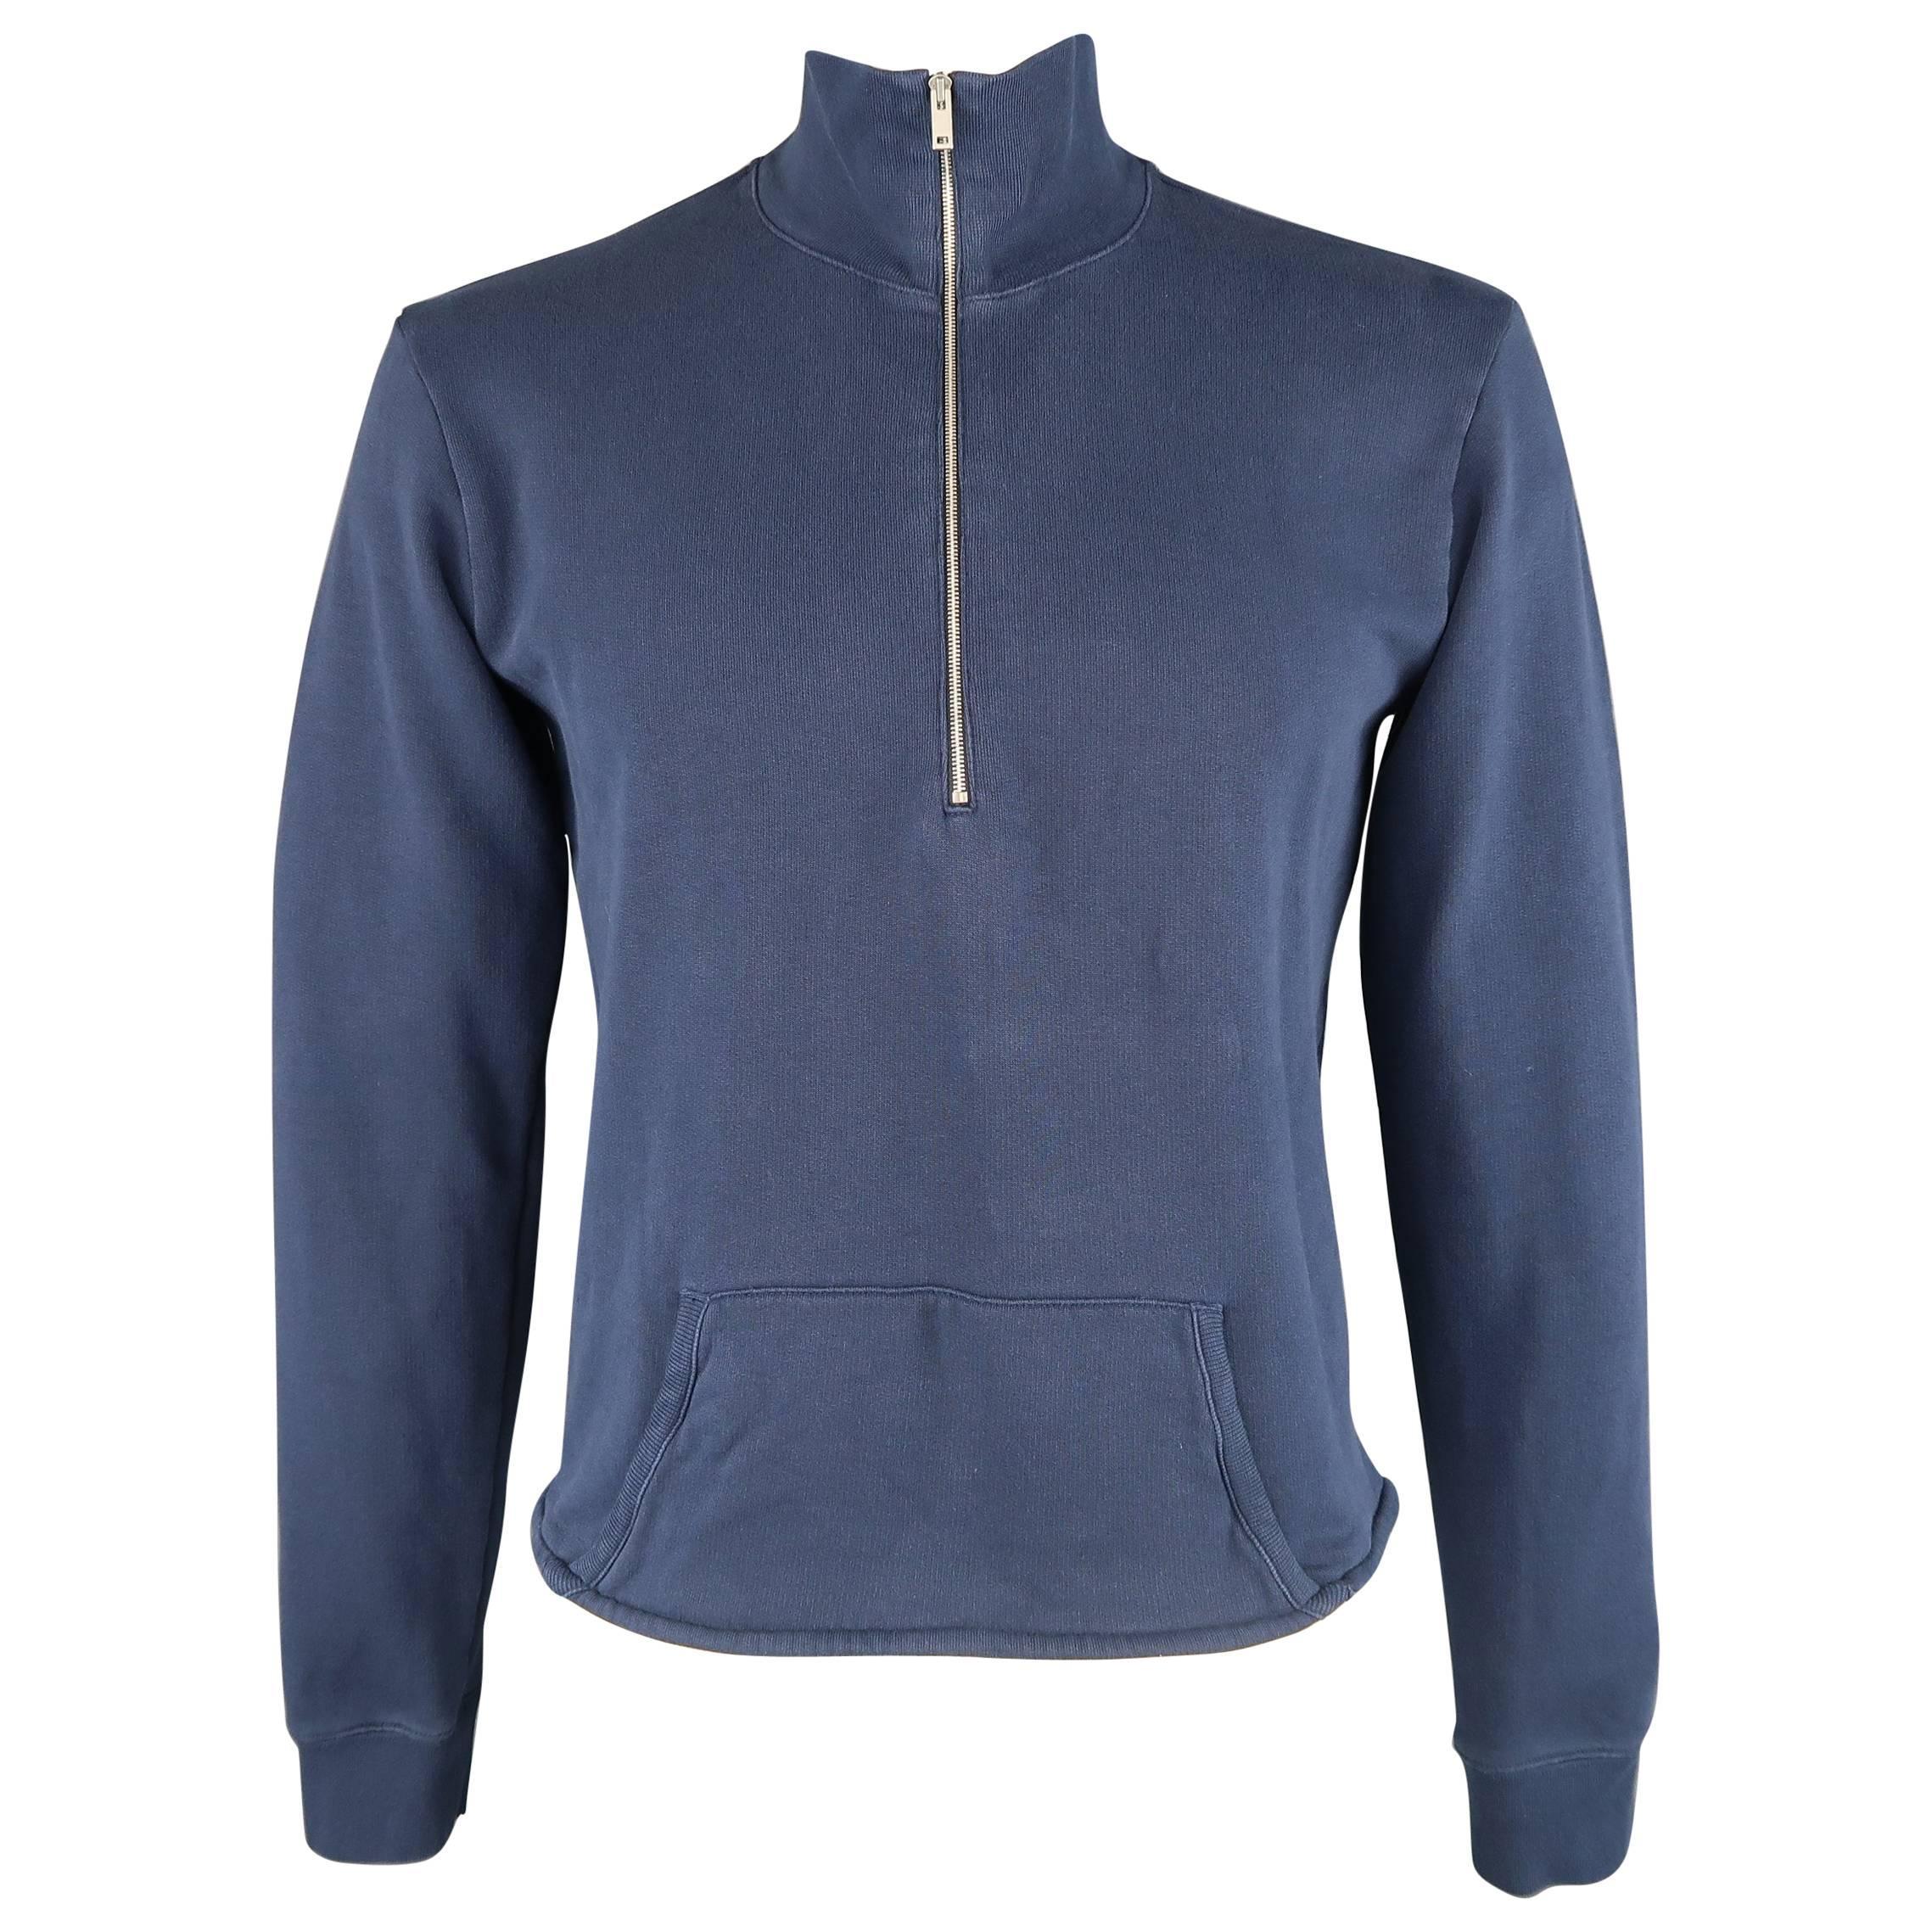 Sweater for Men Jumper On Sale, Black, Cotton, 2017, M S Maison Martin Margiela